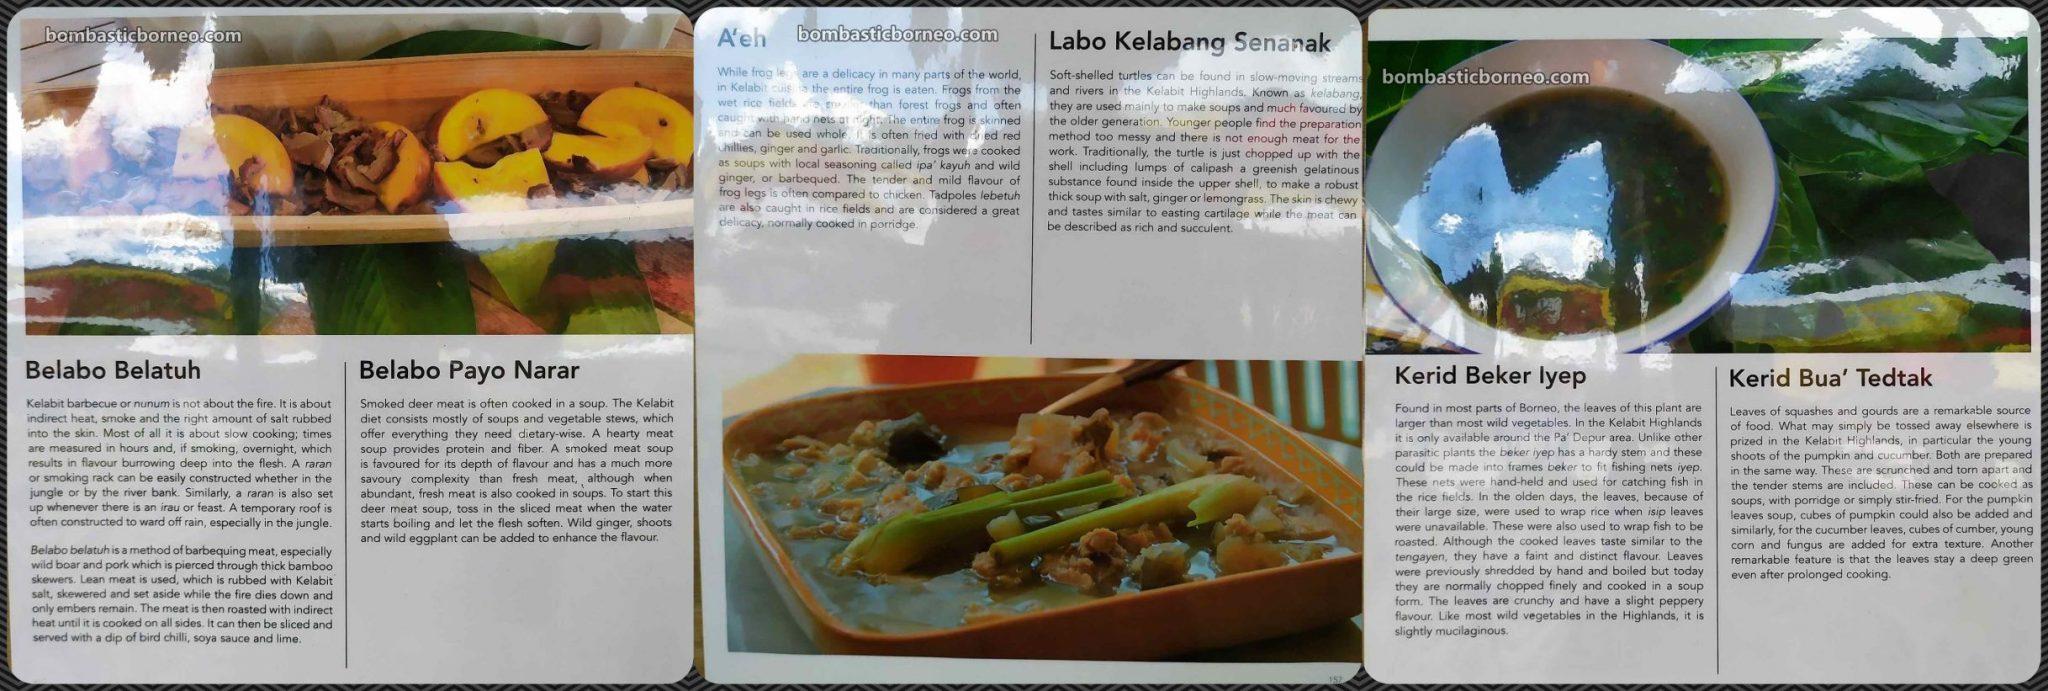 Pesta Nukenen, culture, exotic culinary, authentic, exploration, dayak, Ethnic, native, tribal, Kelabit Highlands, Malaysia, Tourism, travel guide, 马来西亚砂拉越, 巴里奥加拉毕传统美食